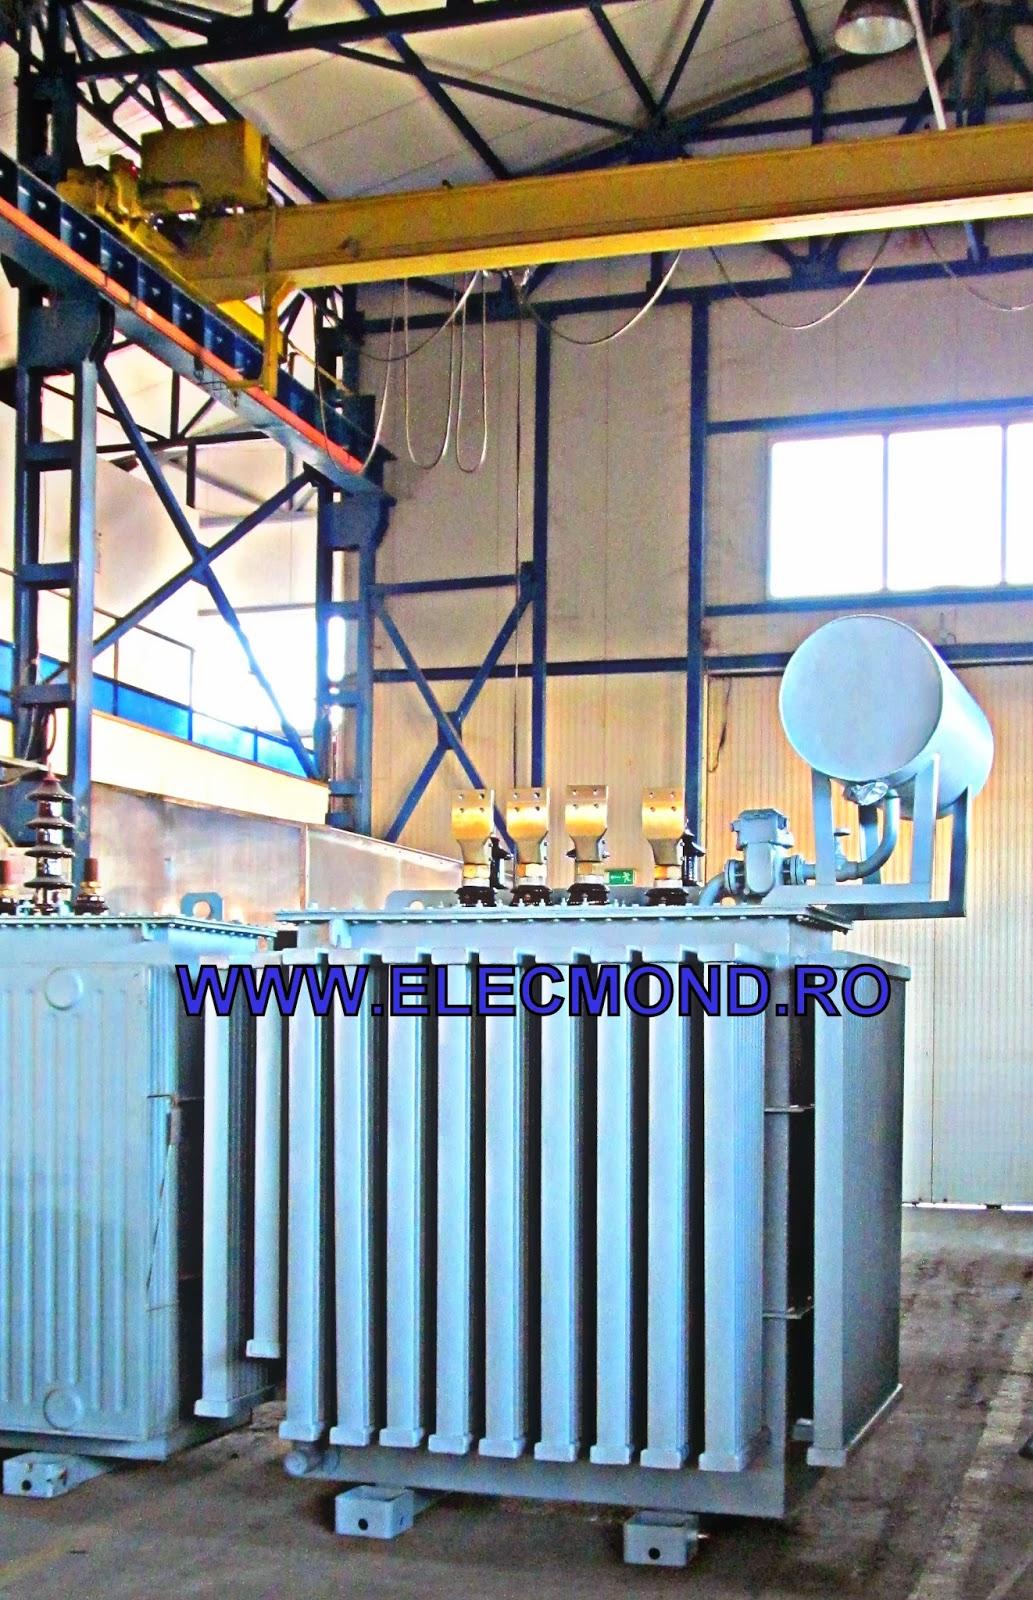 transformator 1600 kVA,Oferta transformatoare ,, elecmond  , transformatoare electrice , transformator , preturi transformatoare , transformator de putere , 1000kVA, 1600kVA, 400kVA , 2000kVA, 630kVA